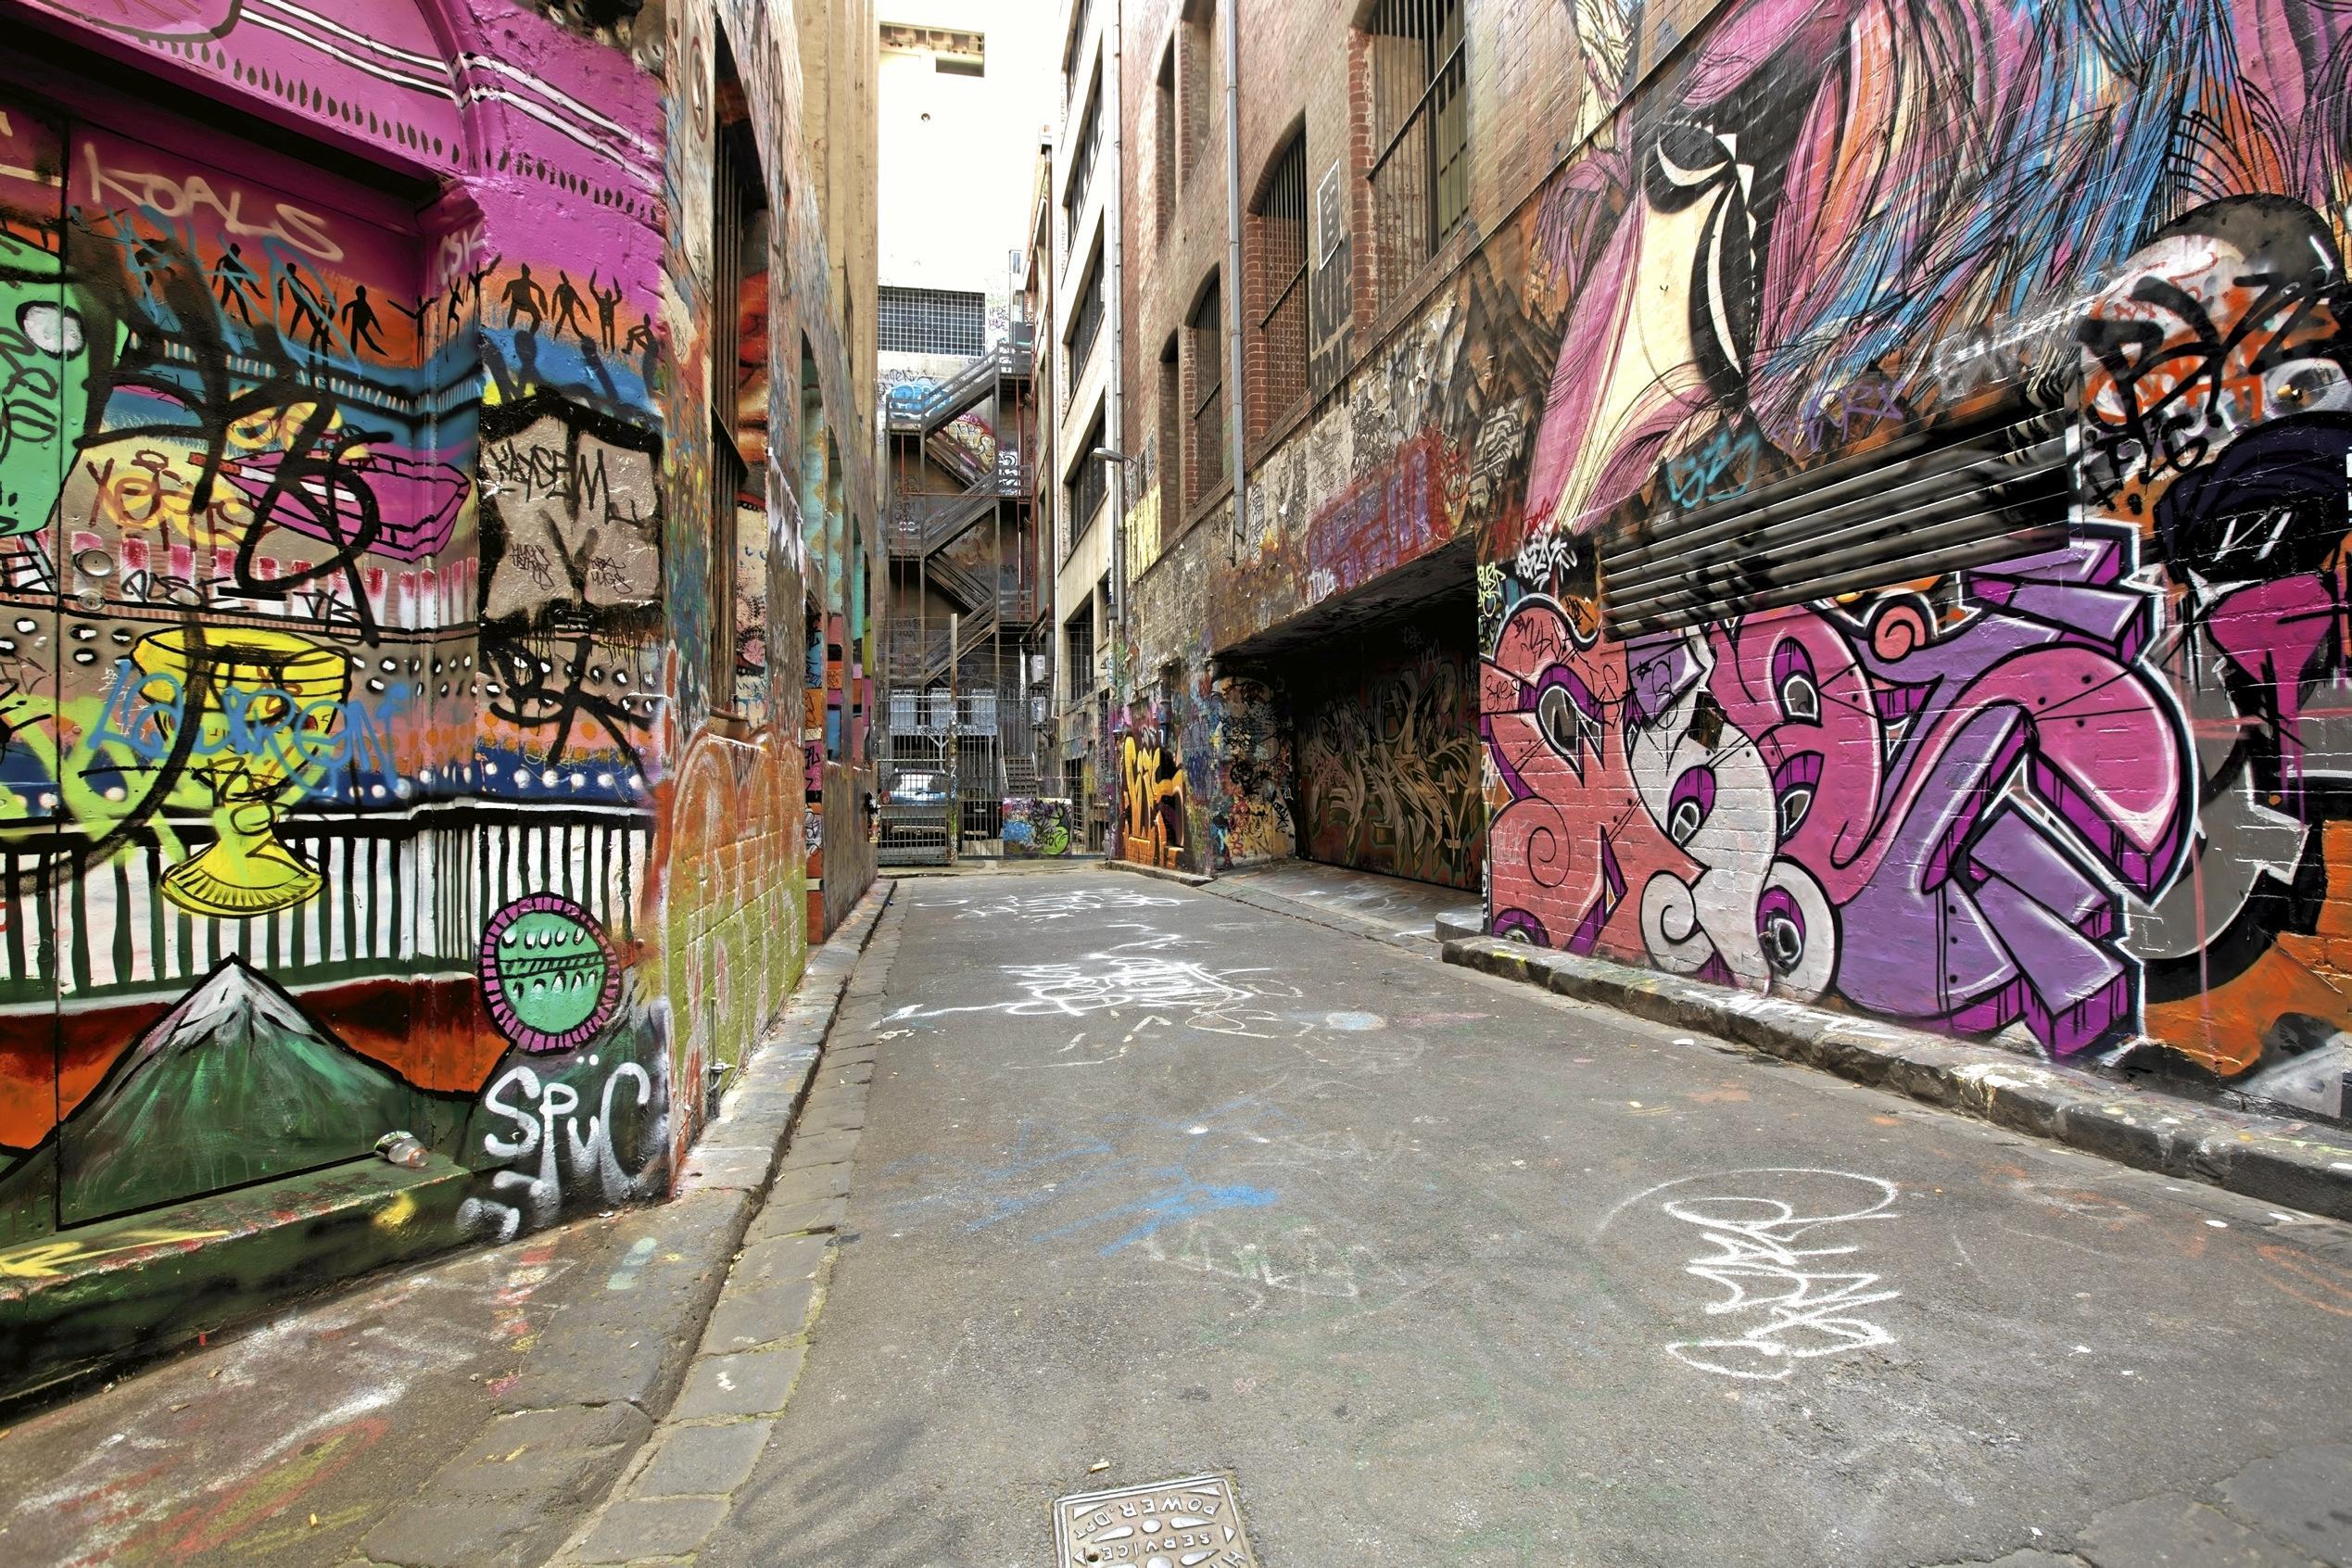 Funky melbourne inspired lane slated for ipswich city graffiti